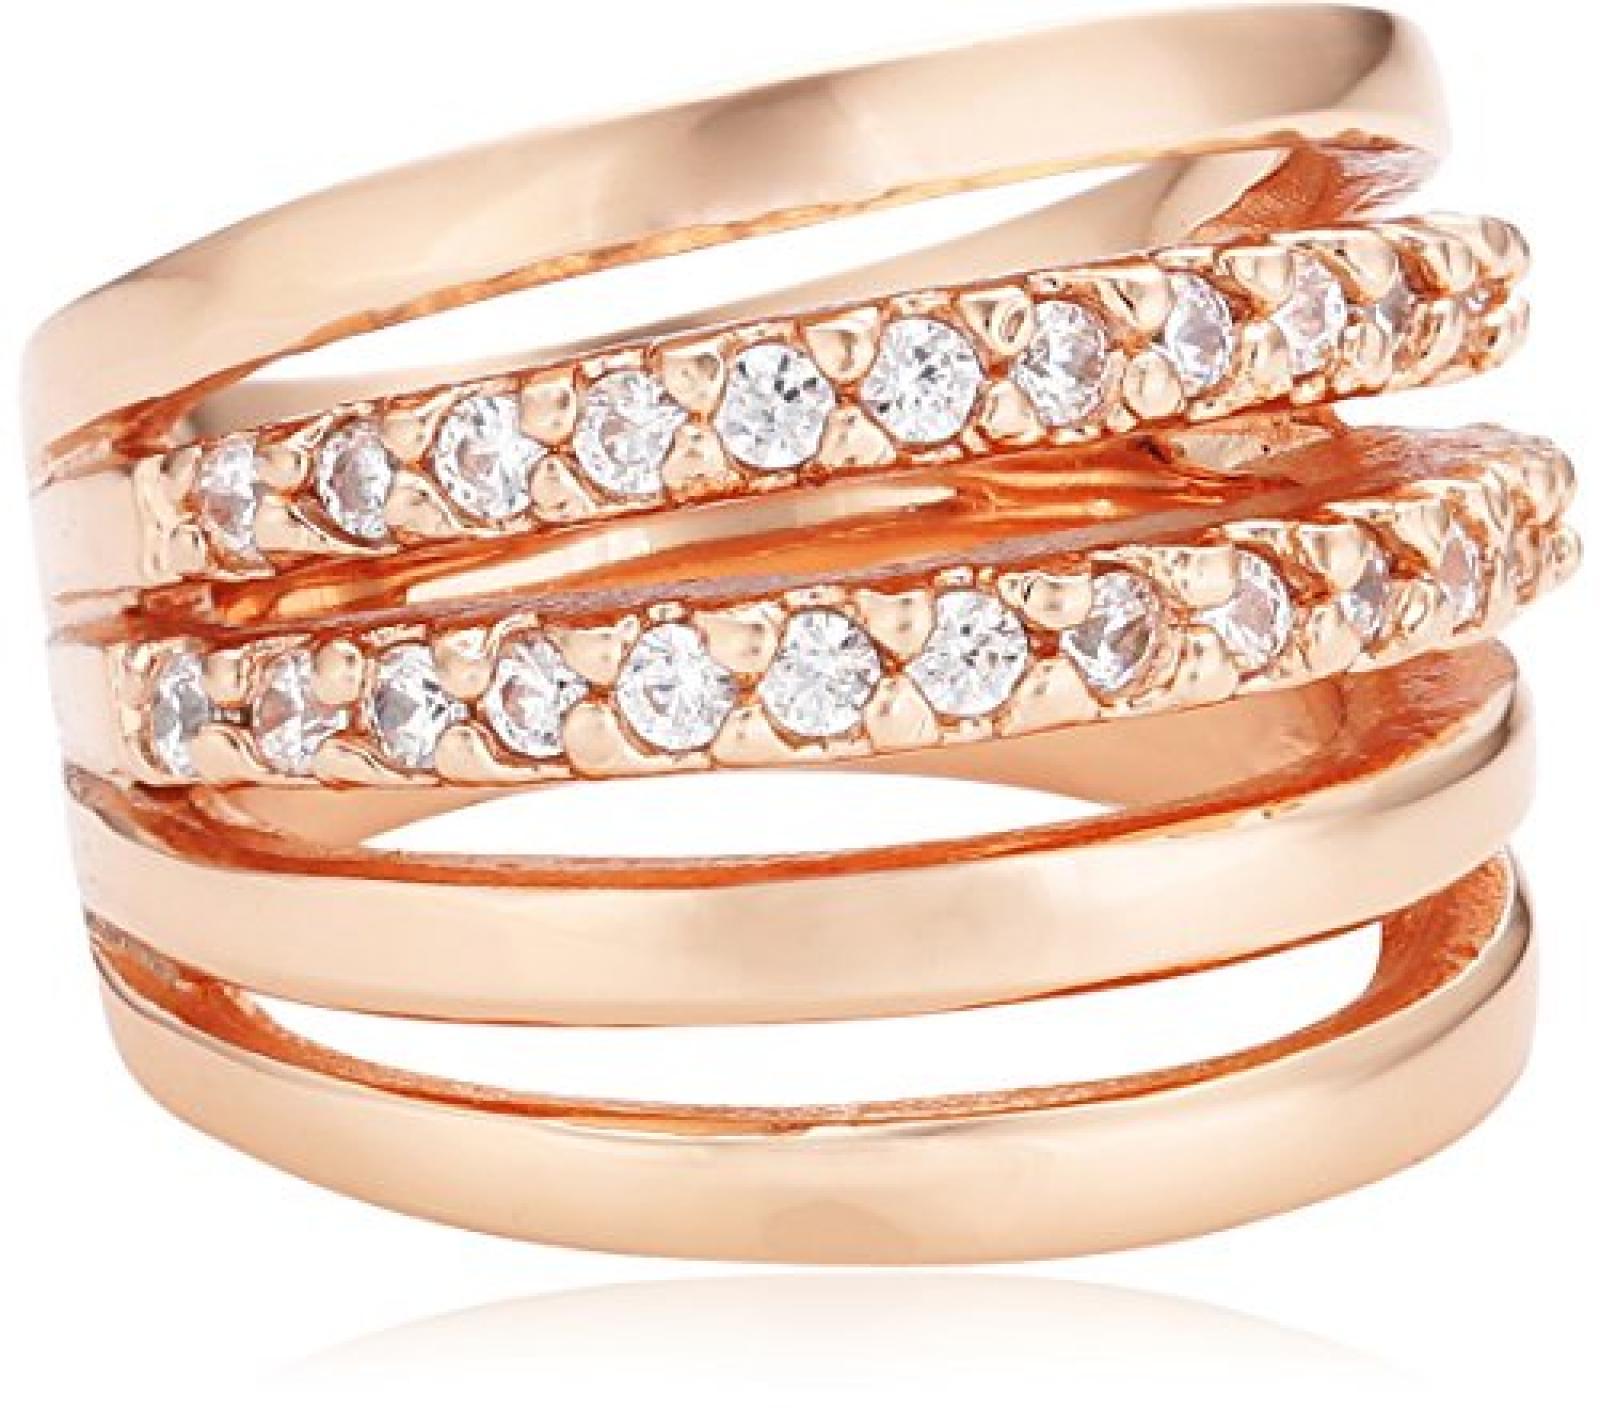 Mike Ellis New York Damen-Ring Edelstahl Zirkonia weiß Gr.56 (17.8) D1519C/8